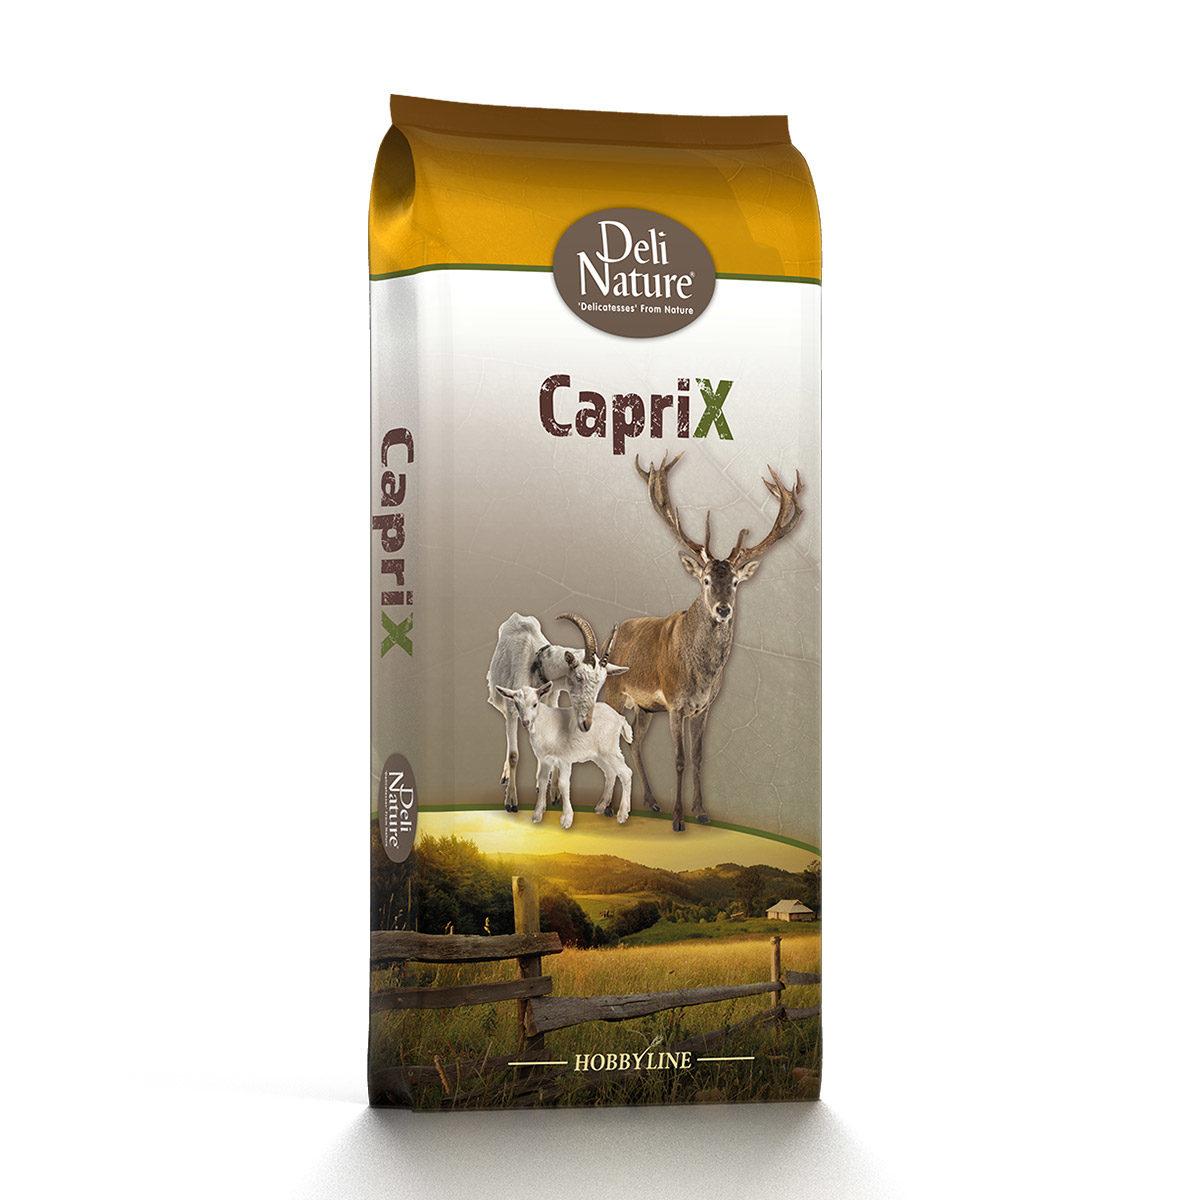 Deli Nature CapriX Onderhoud-Pellet 20kg